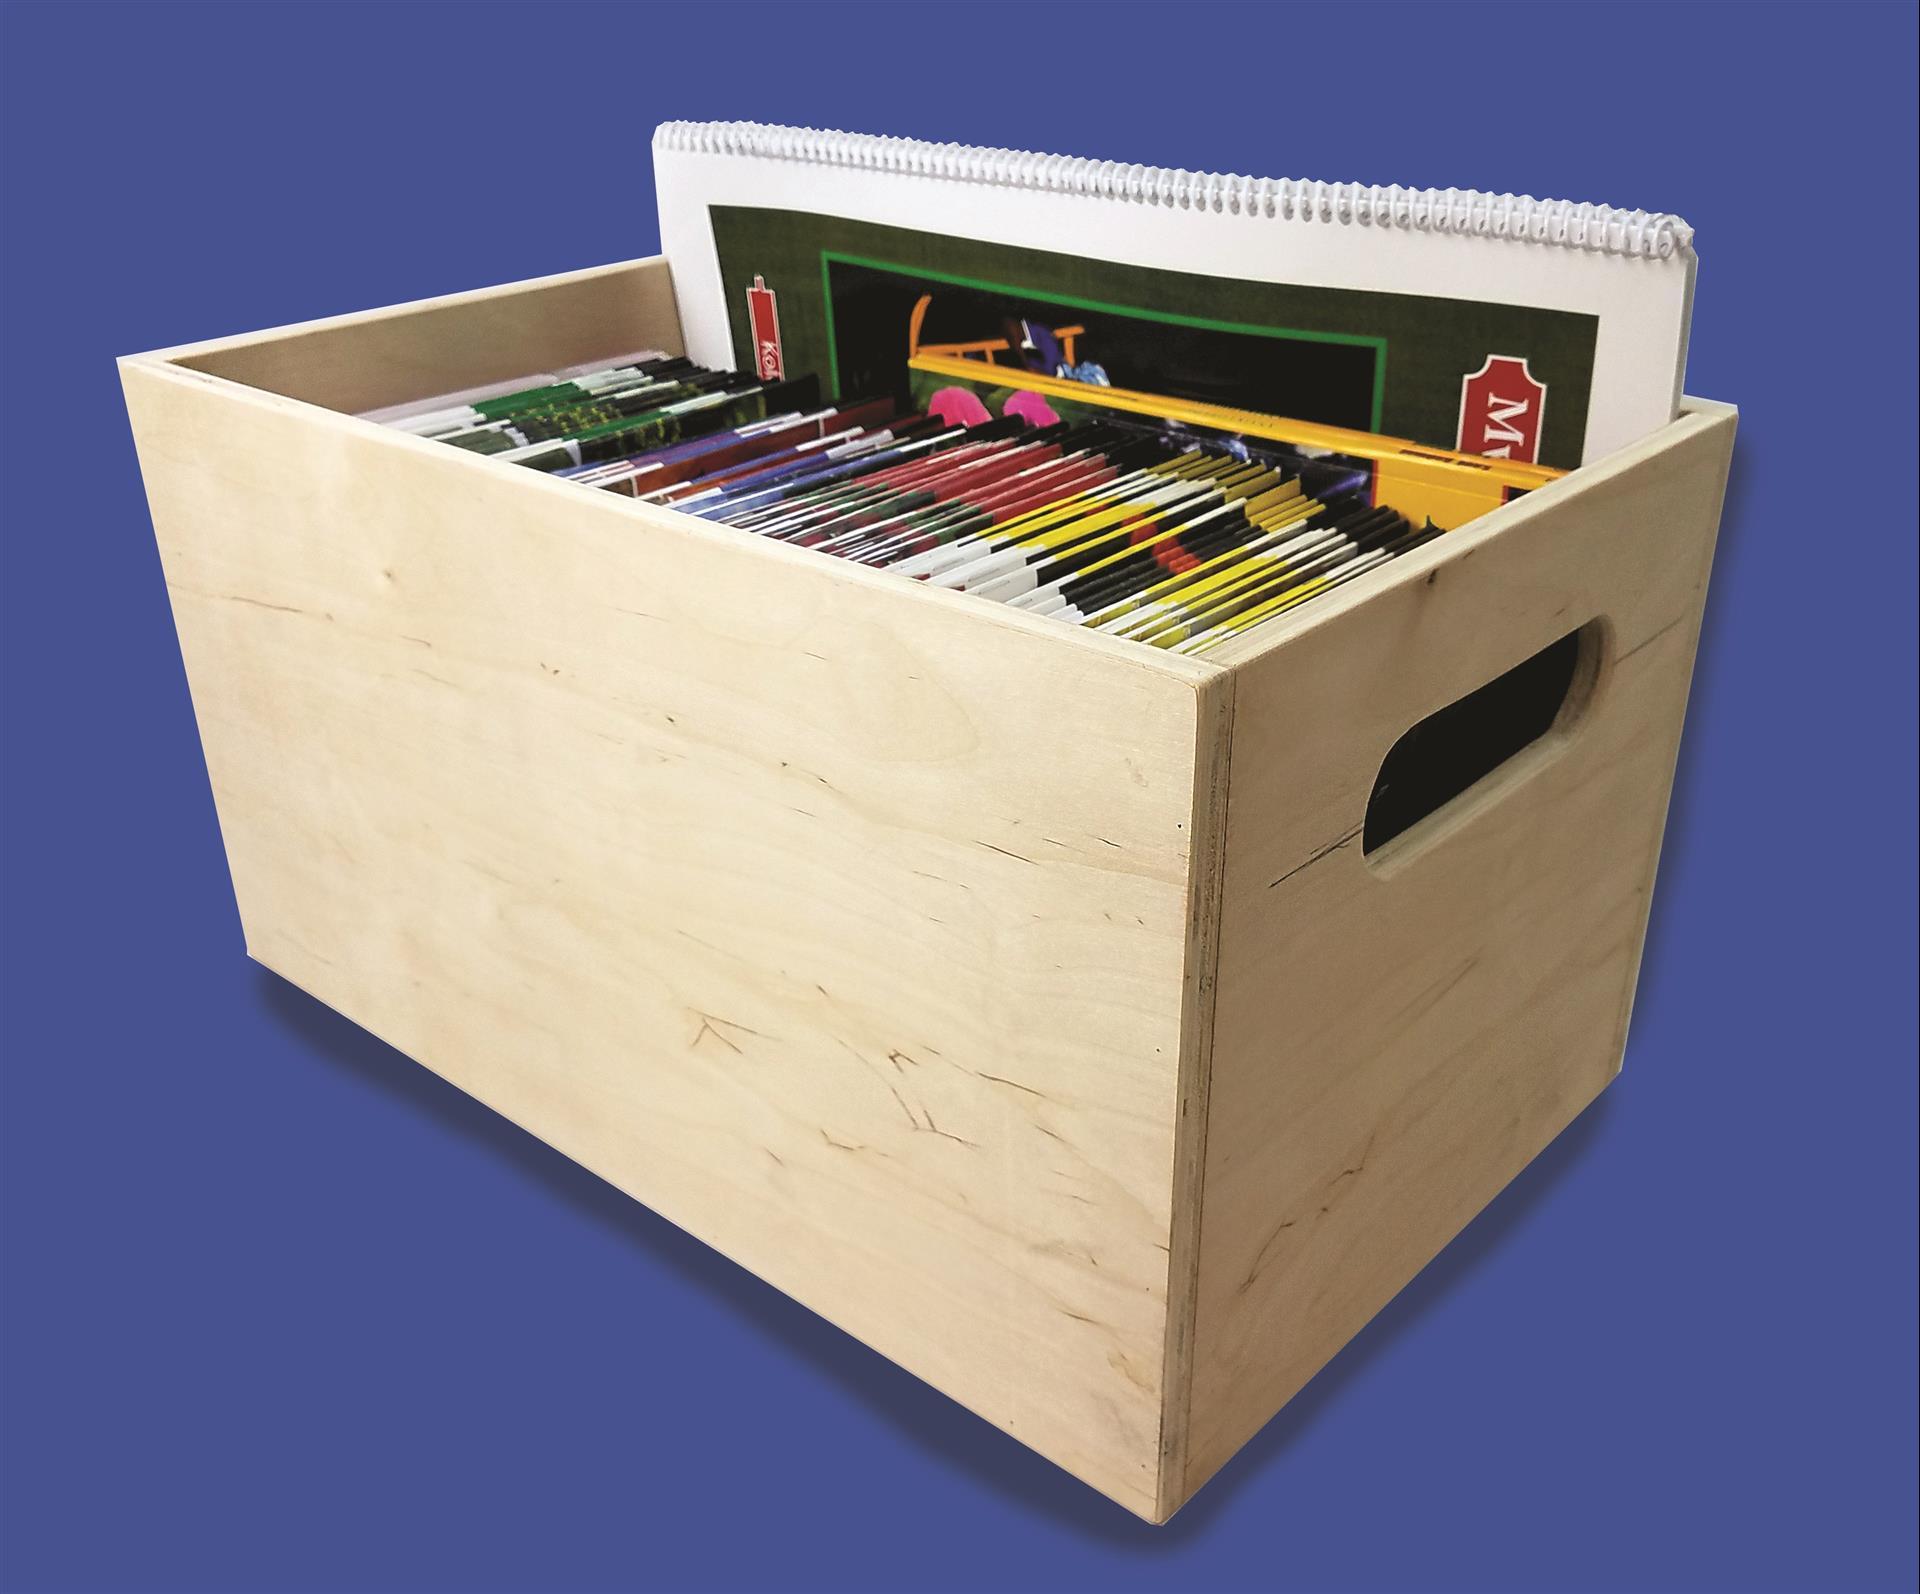 Portable Library for Grades 3 - 5 / Bibliyotèk mobil 3 - 5